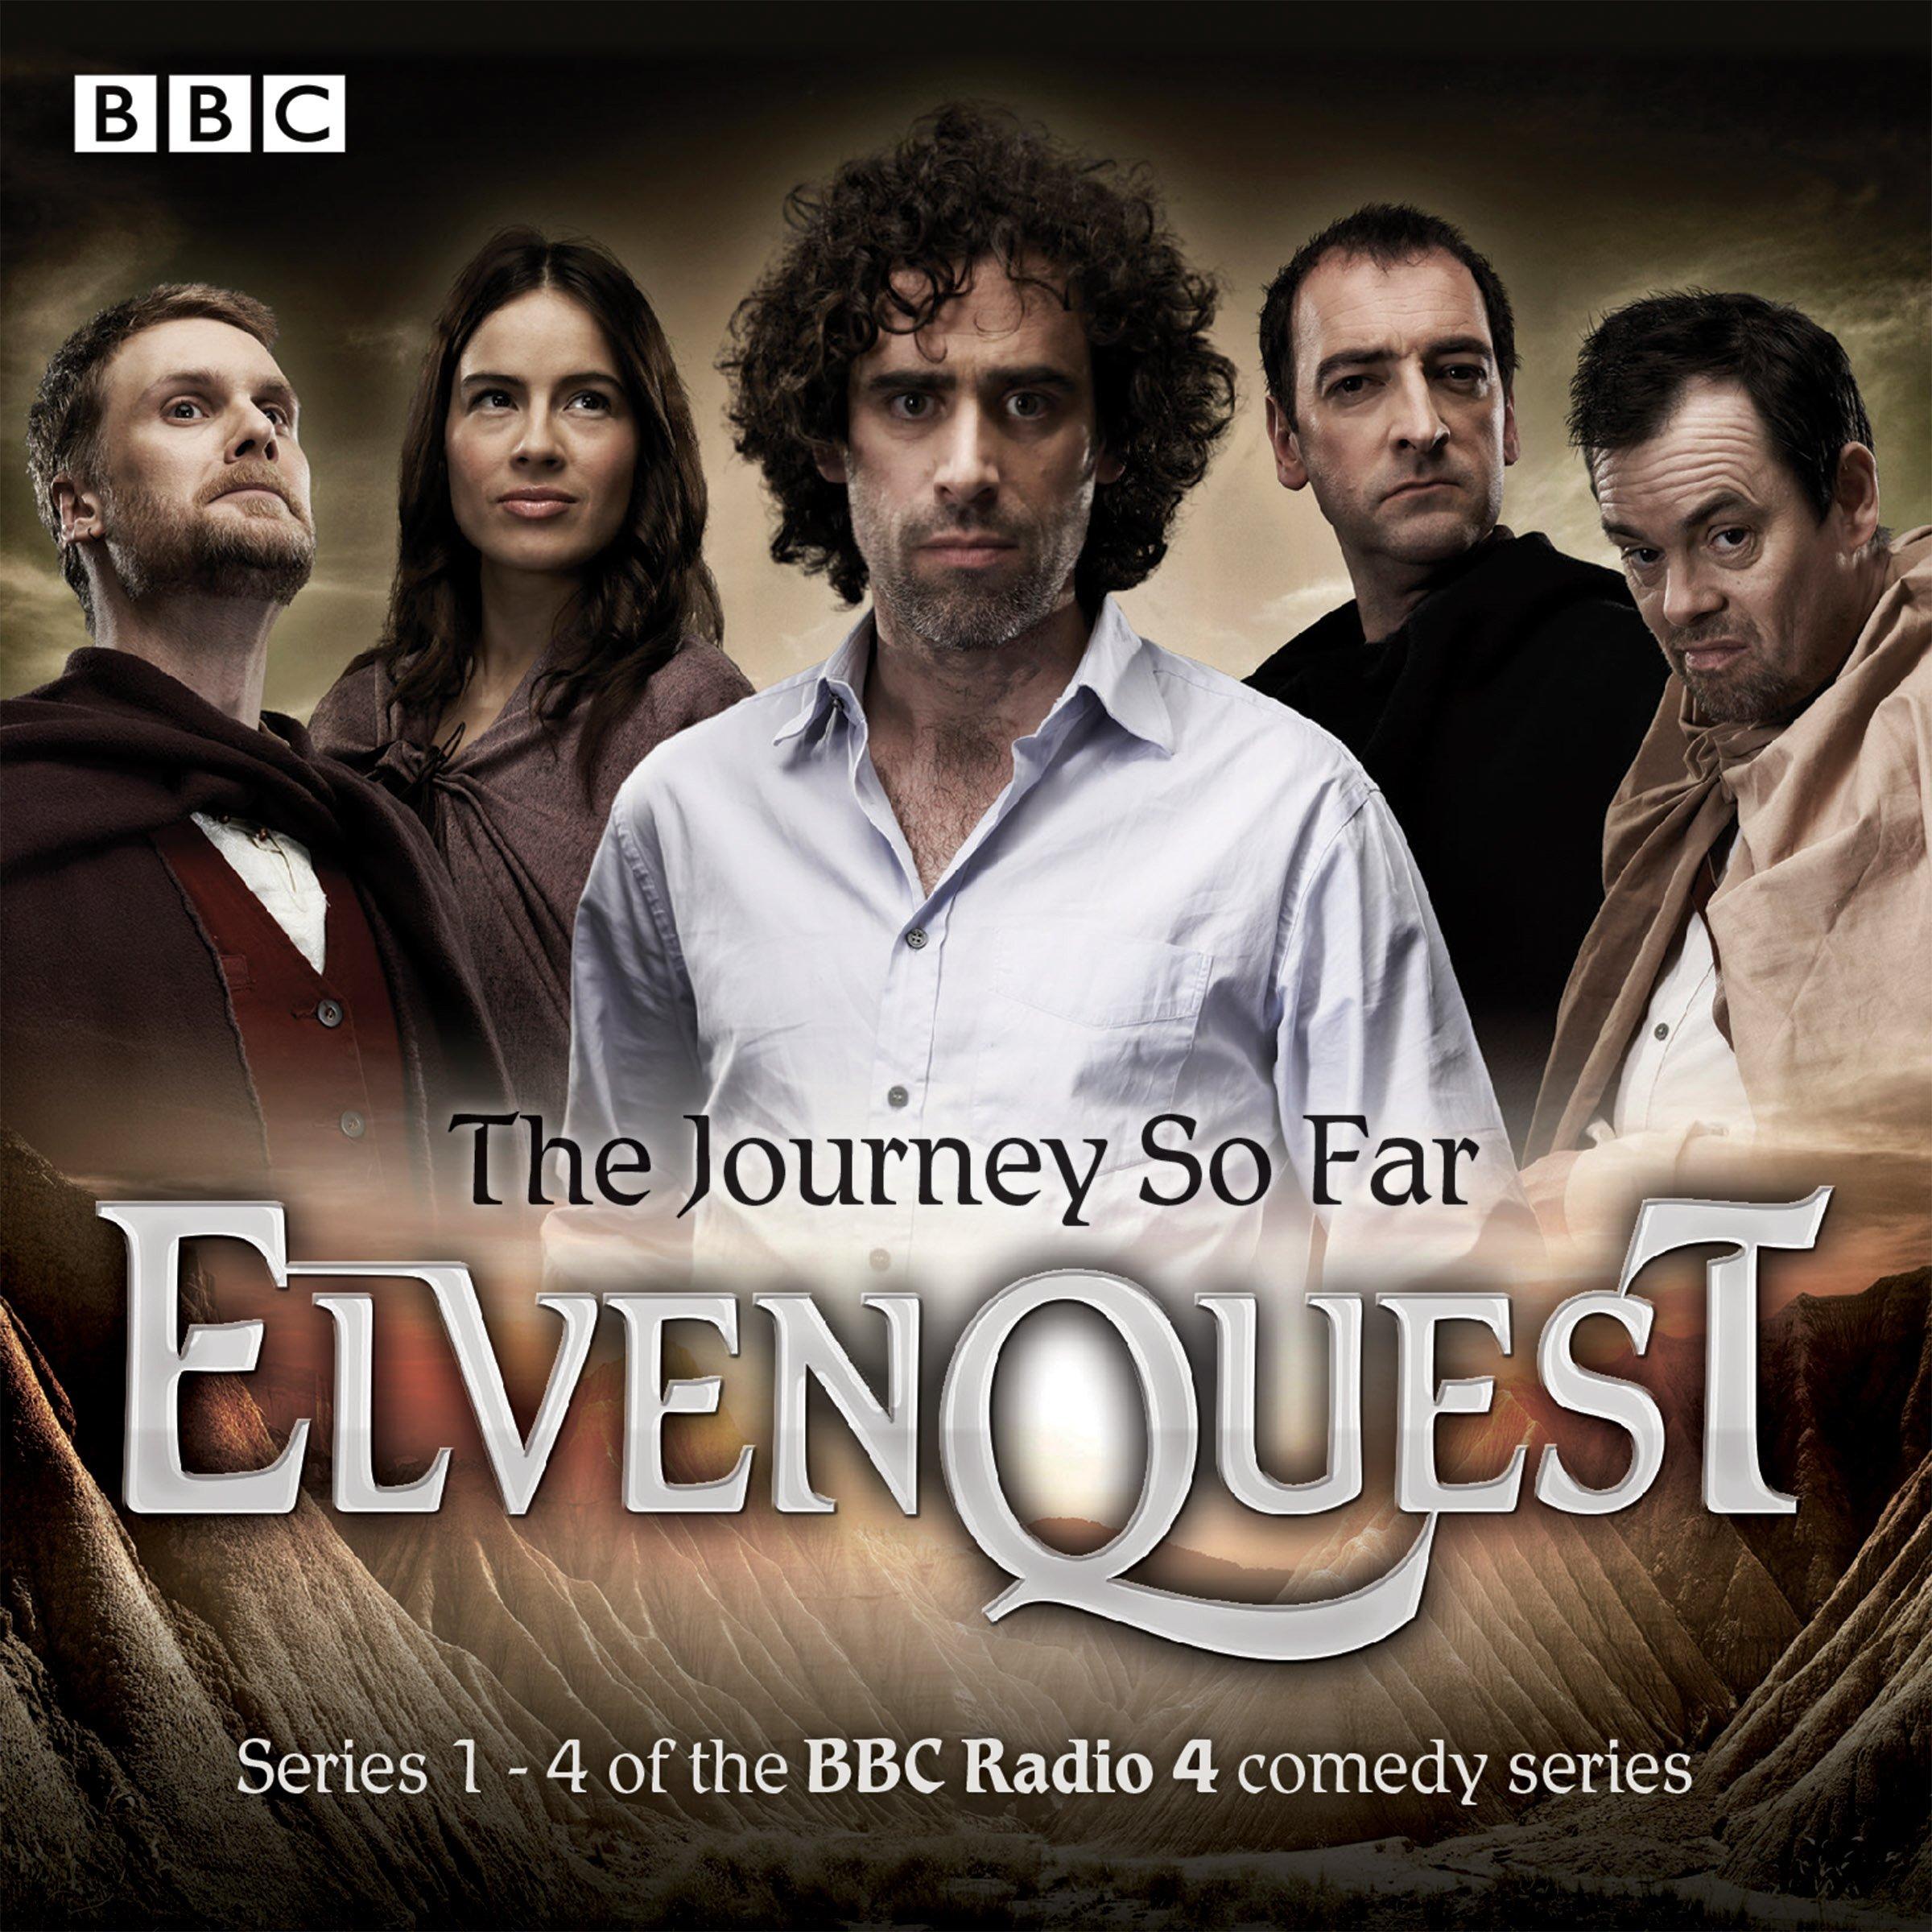 Elvenquest: The Journey So Far: Series 1, 2, 3 and 4: 1-4: Amazon.co.uk:  Anil Gupta, Richard Pinto, Alistair McGowan, Darren Boyd, Dave Lamb, Full  Cast, ...